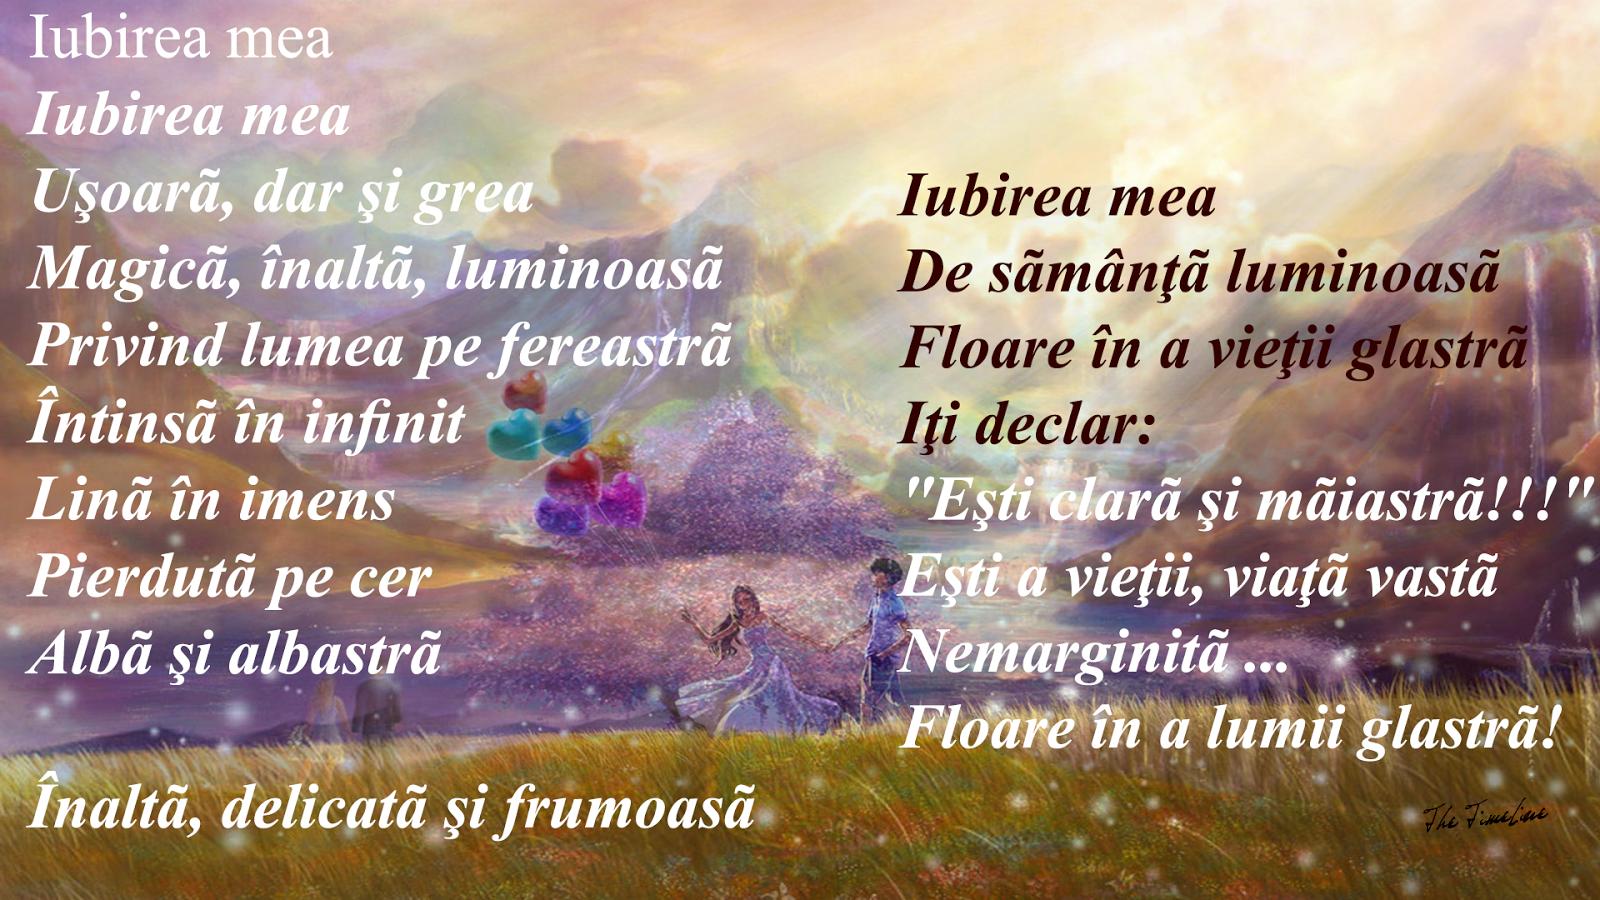 iubirea mea poezie iubire dragoste viata imens infinit Credinta lume Maria Teodorescu Bahnareanu Wrinkles on my Timeline